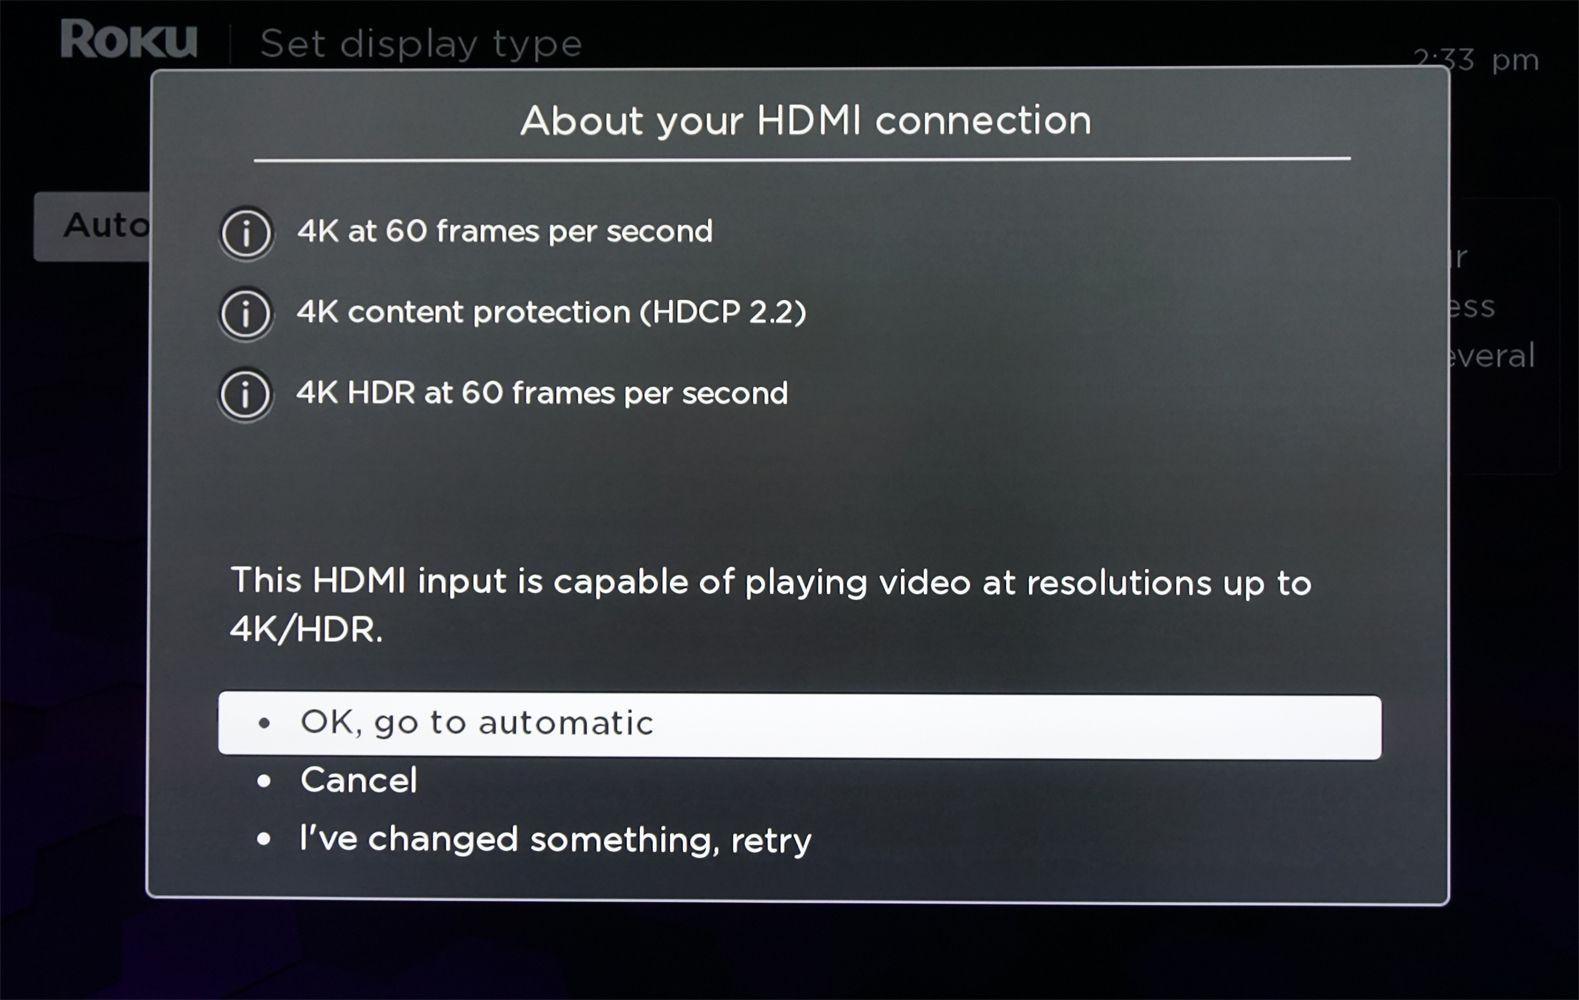 Roku Soundbar – HDMI Connection Analysis